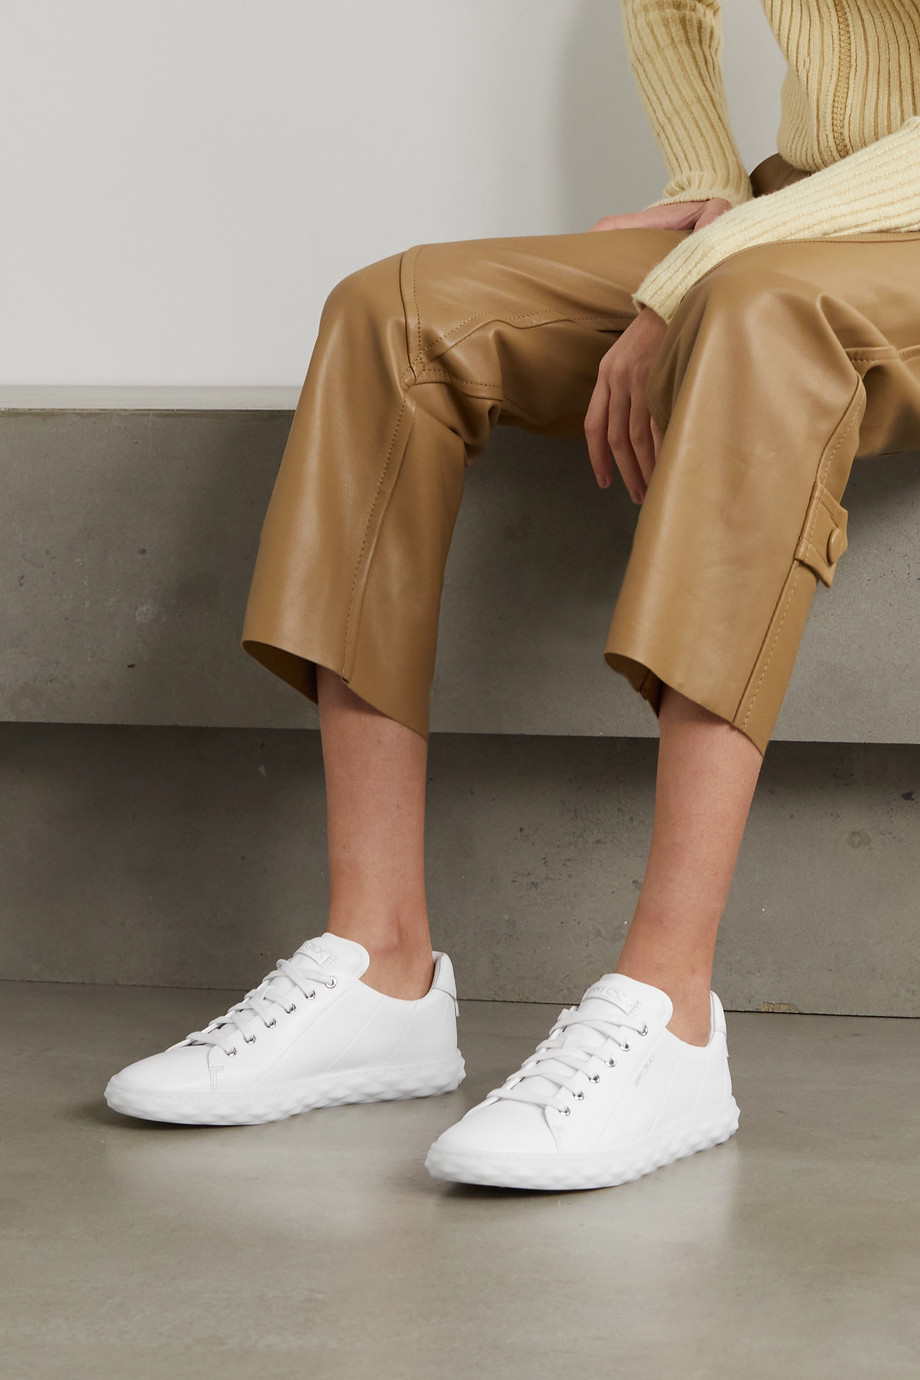 Jimmy Choo Diamond Light leather sneakers